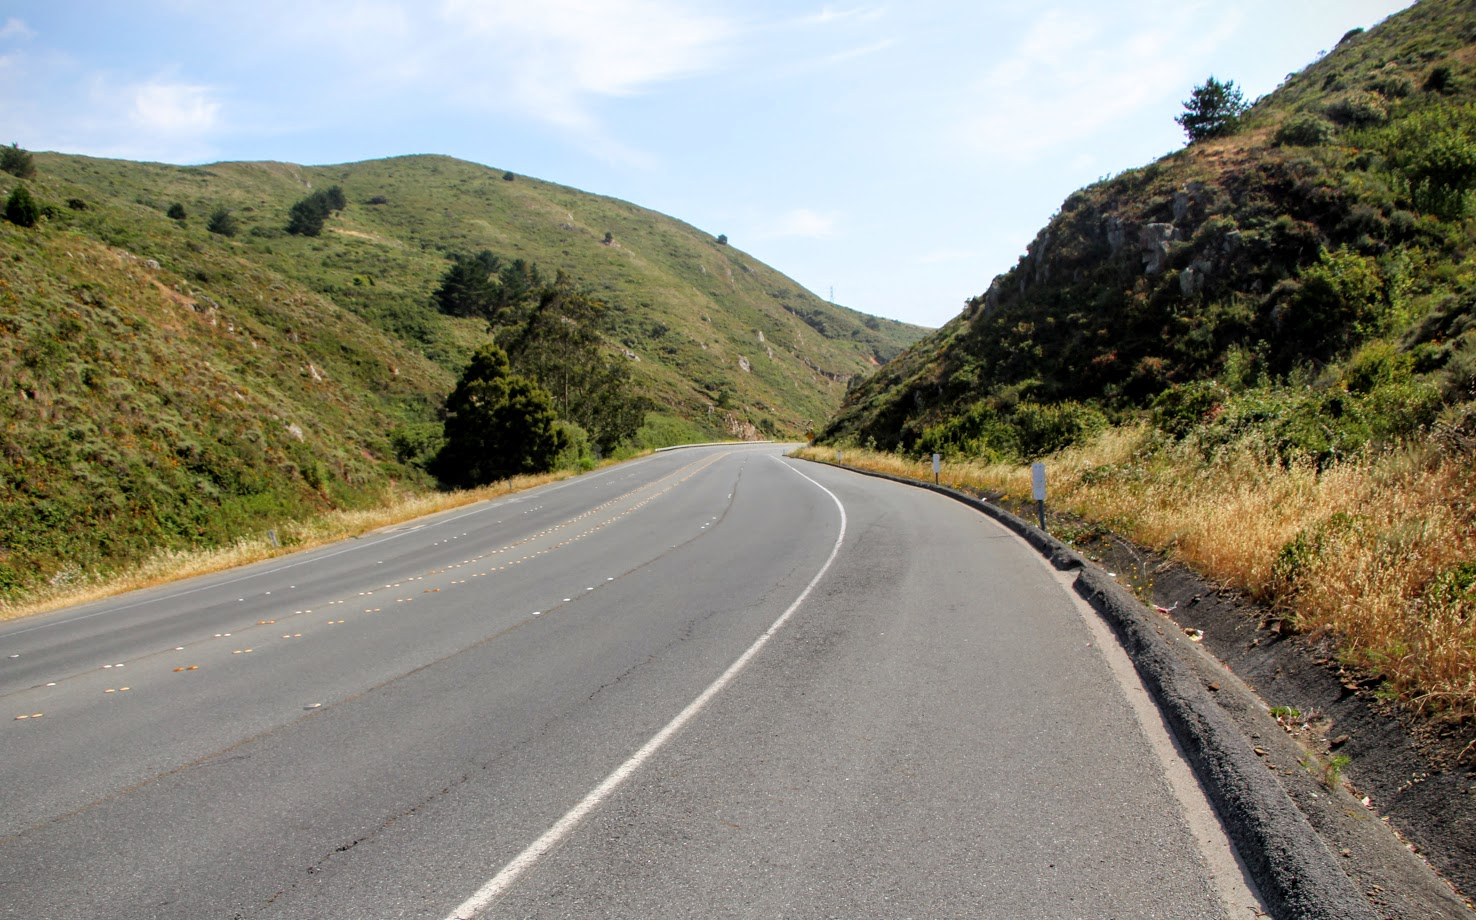 san-bruno-mountain-state-park-2